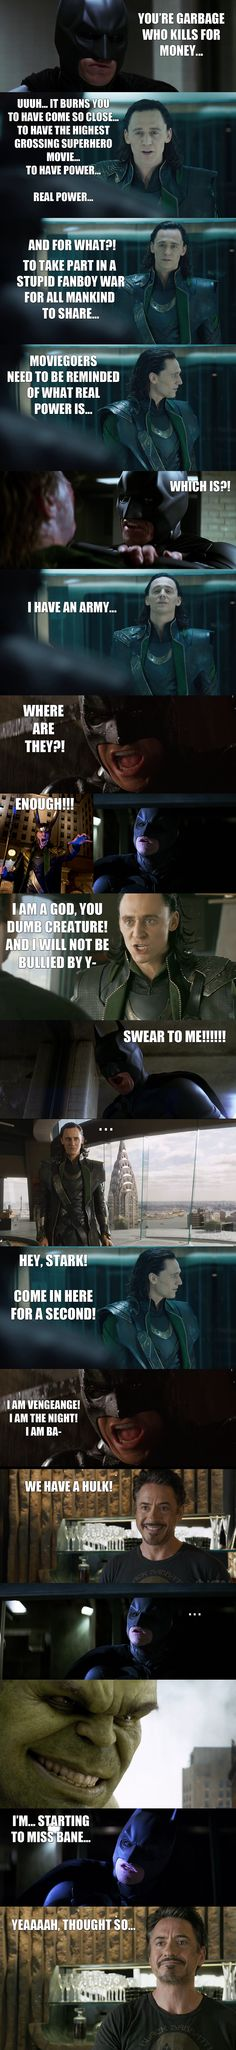 Ha ha but you gotta love all Superhero movies!!